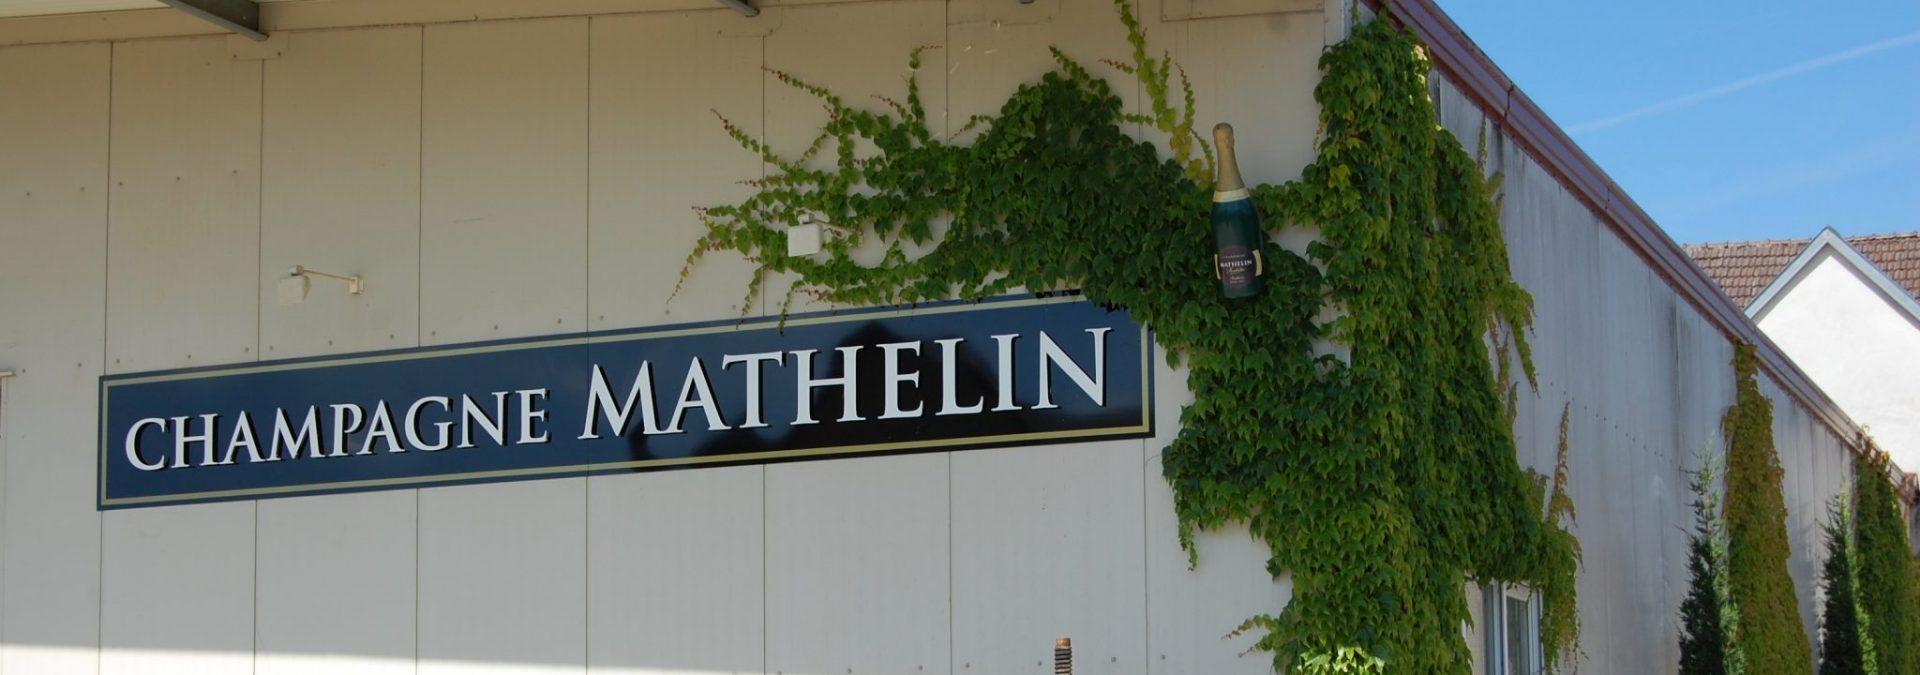 Champagne Mathelin